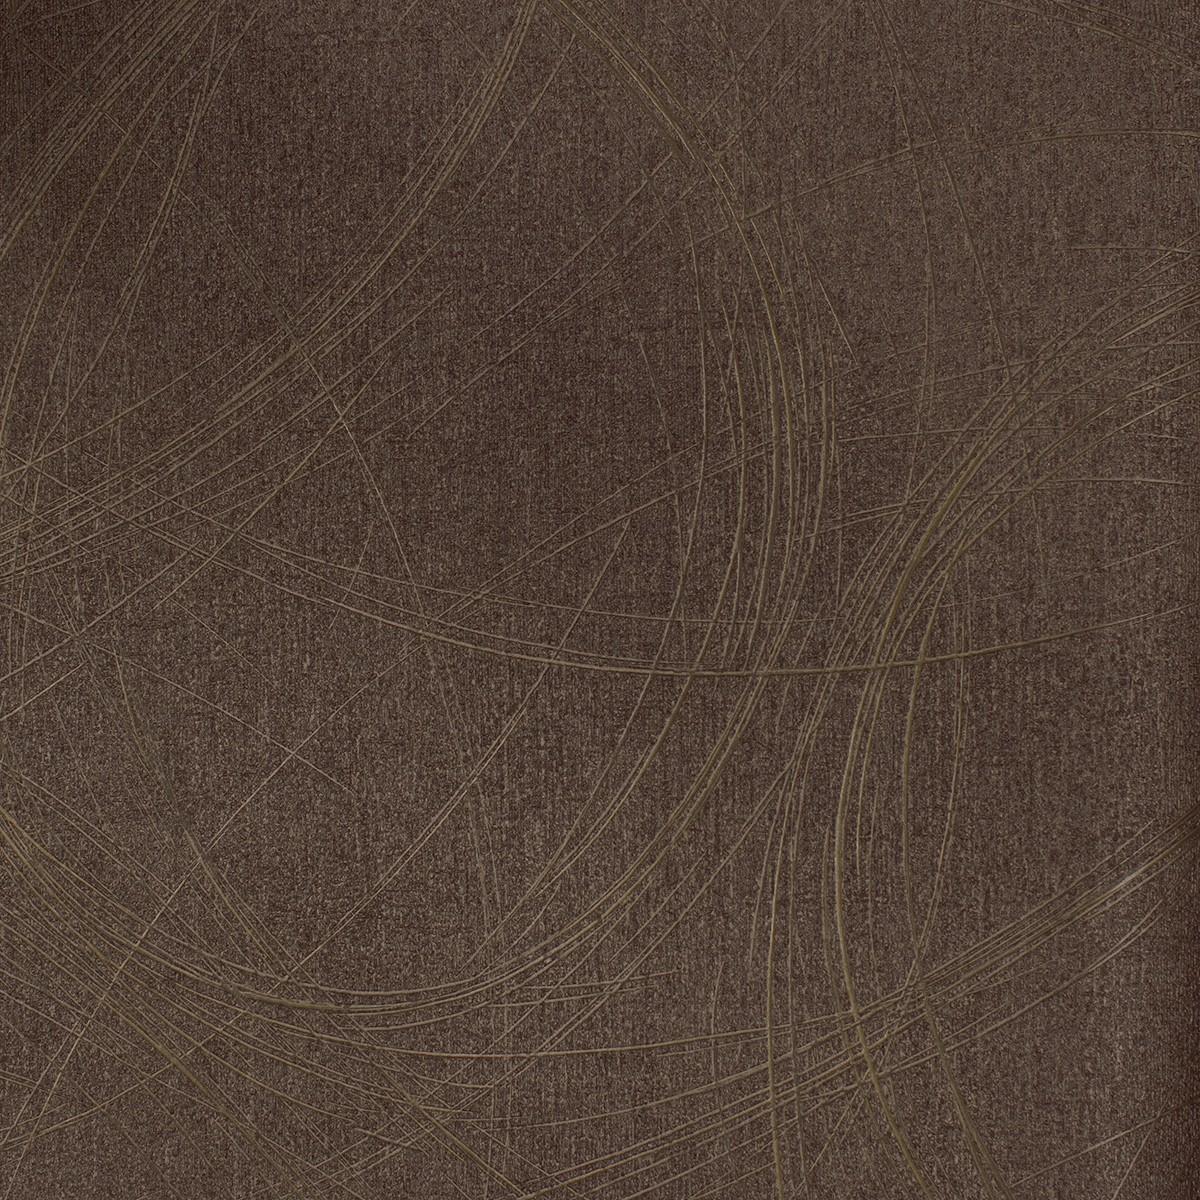 luigi colani visions vliestapete marburg tapete 53323. Black Bedroom Furniture Sets. Home Design Ideas